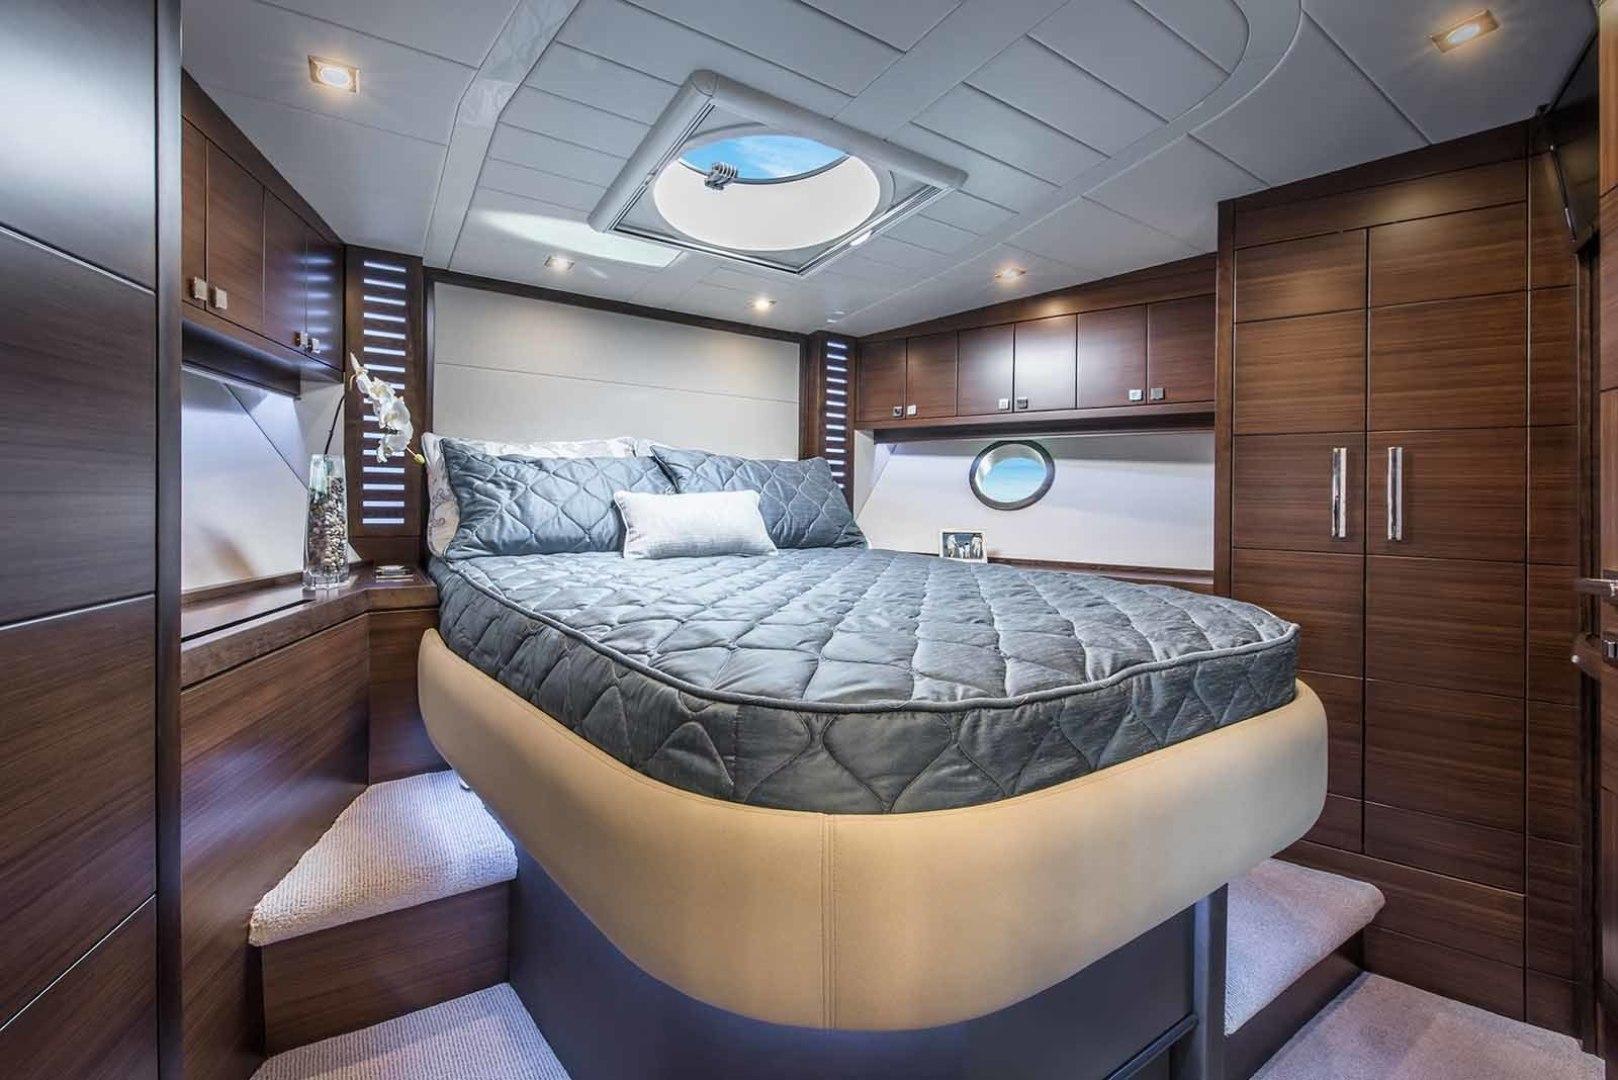 Neptunus-Express 2016-CAPTAIN HIGHWAY Hilton Head-South Carolina-United States-VIP-1458926 | Thumbnail